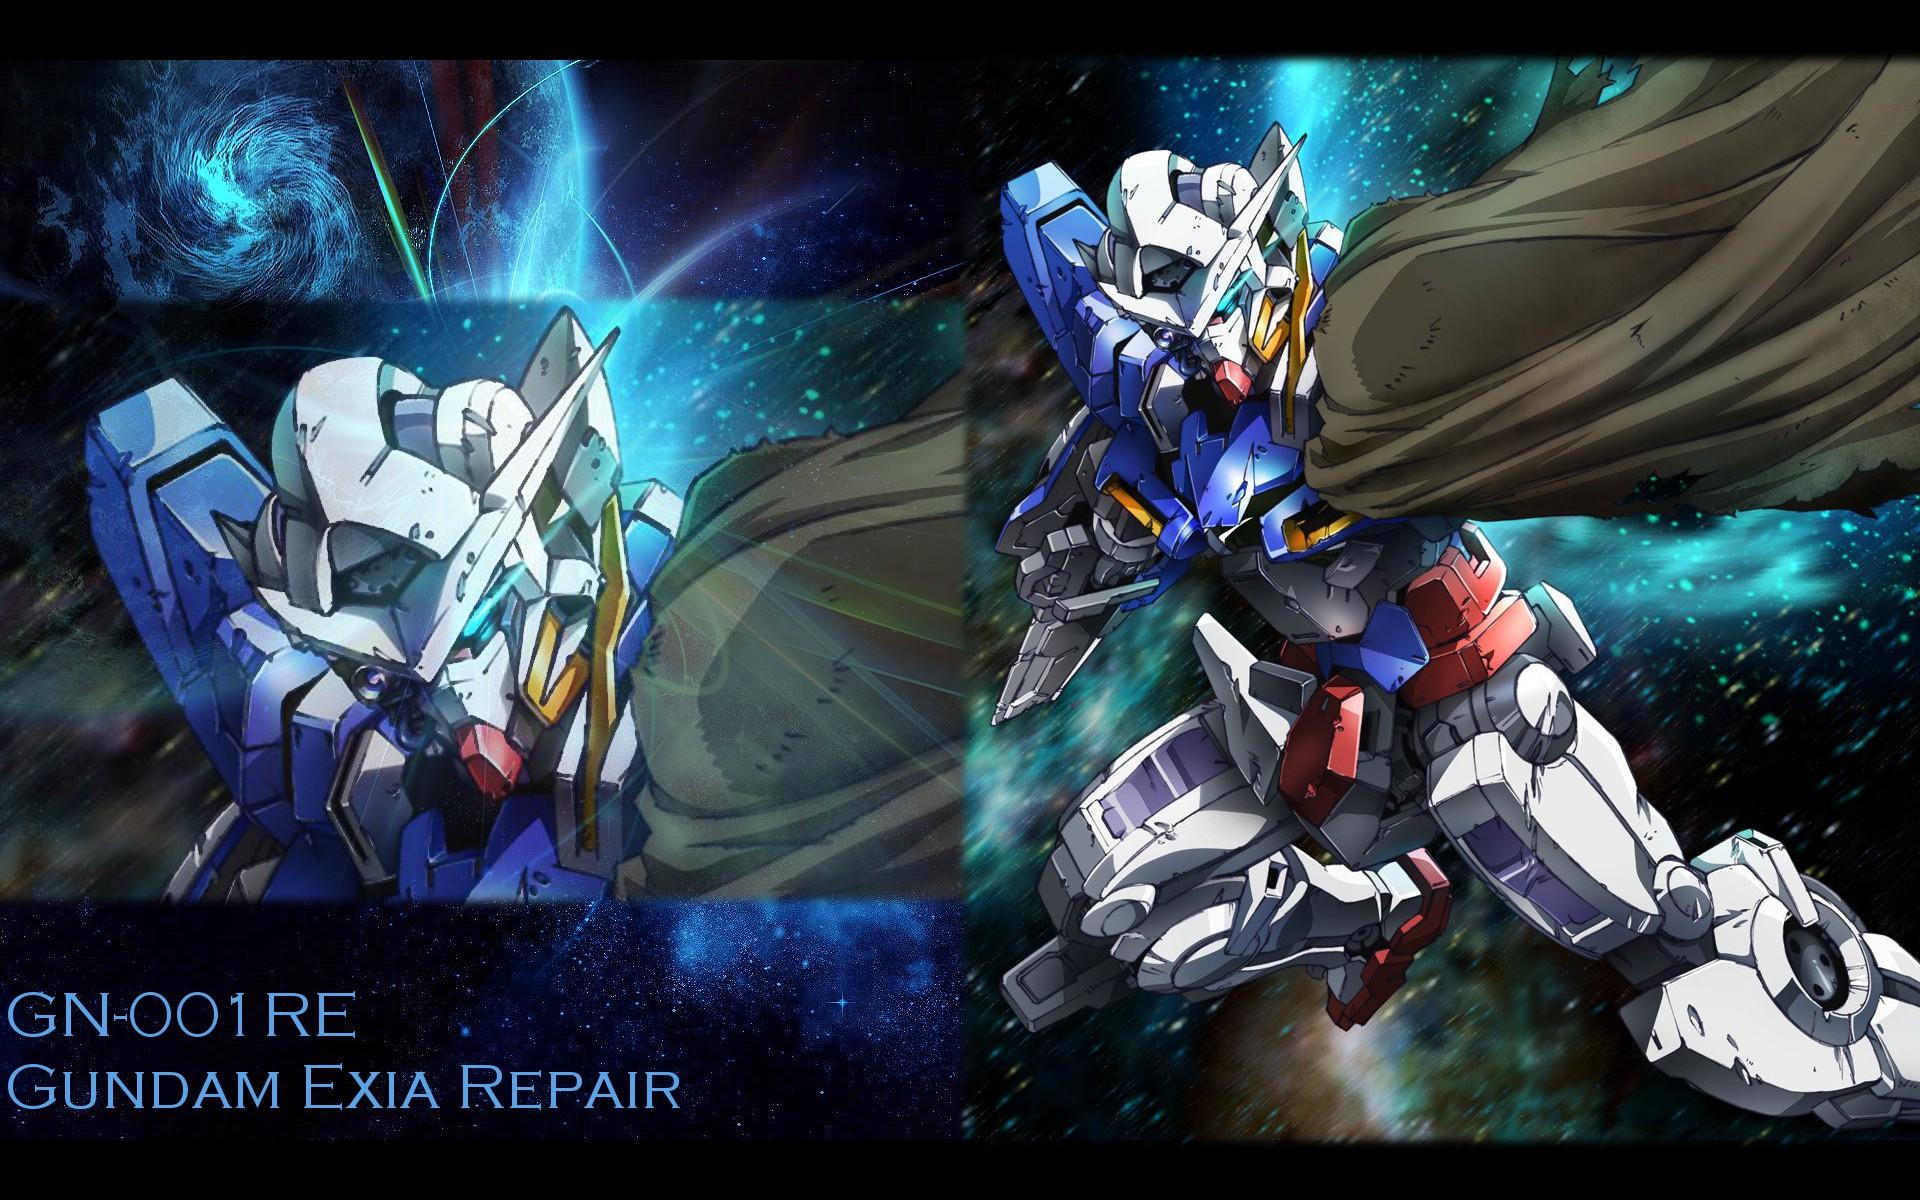 Mobile Suit Gundam 00 Wallpaper 188661 Zerochan Anime Image Board